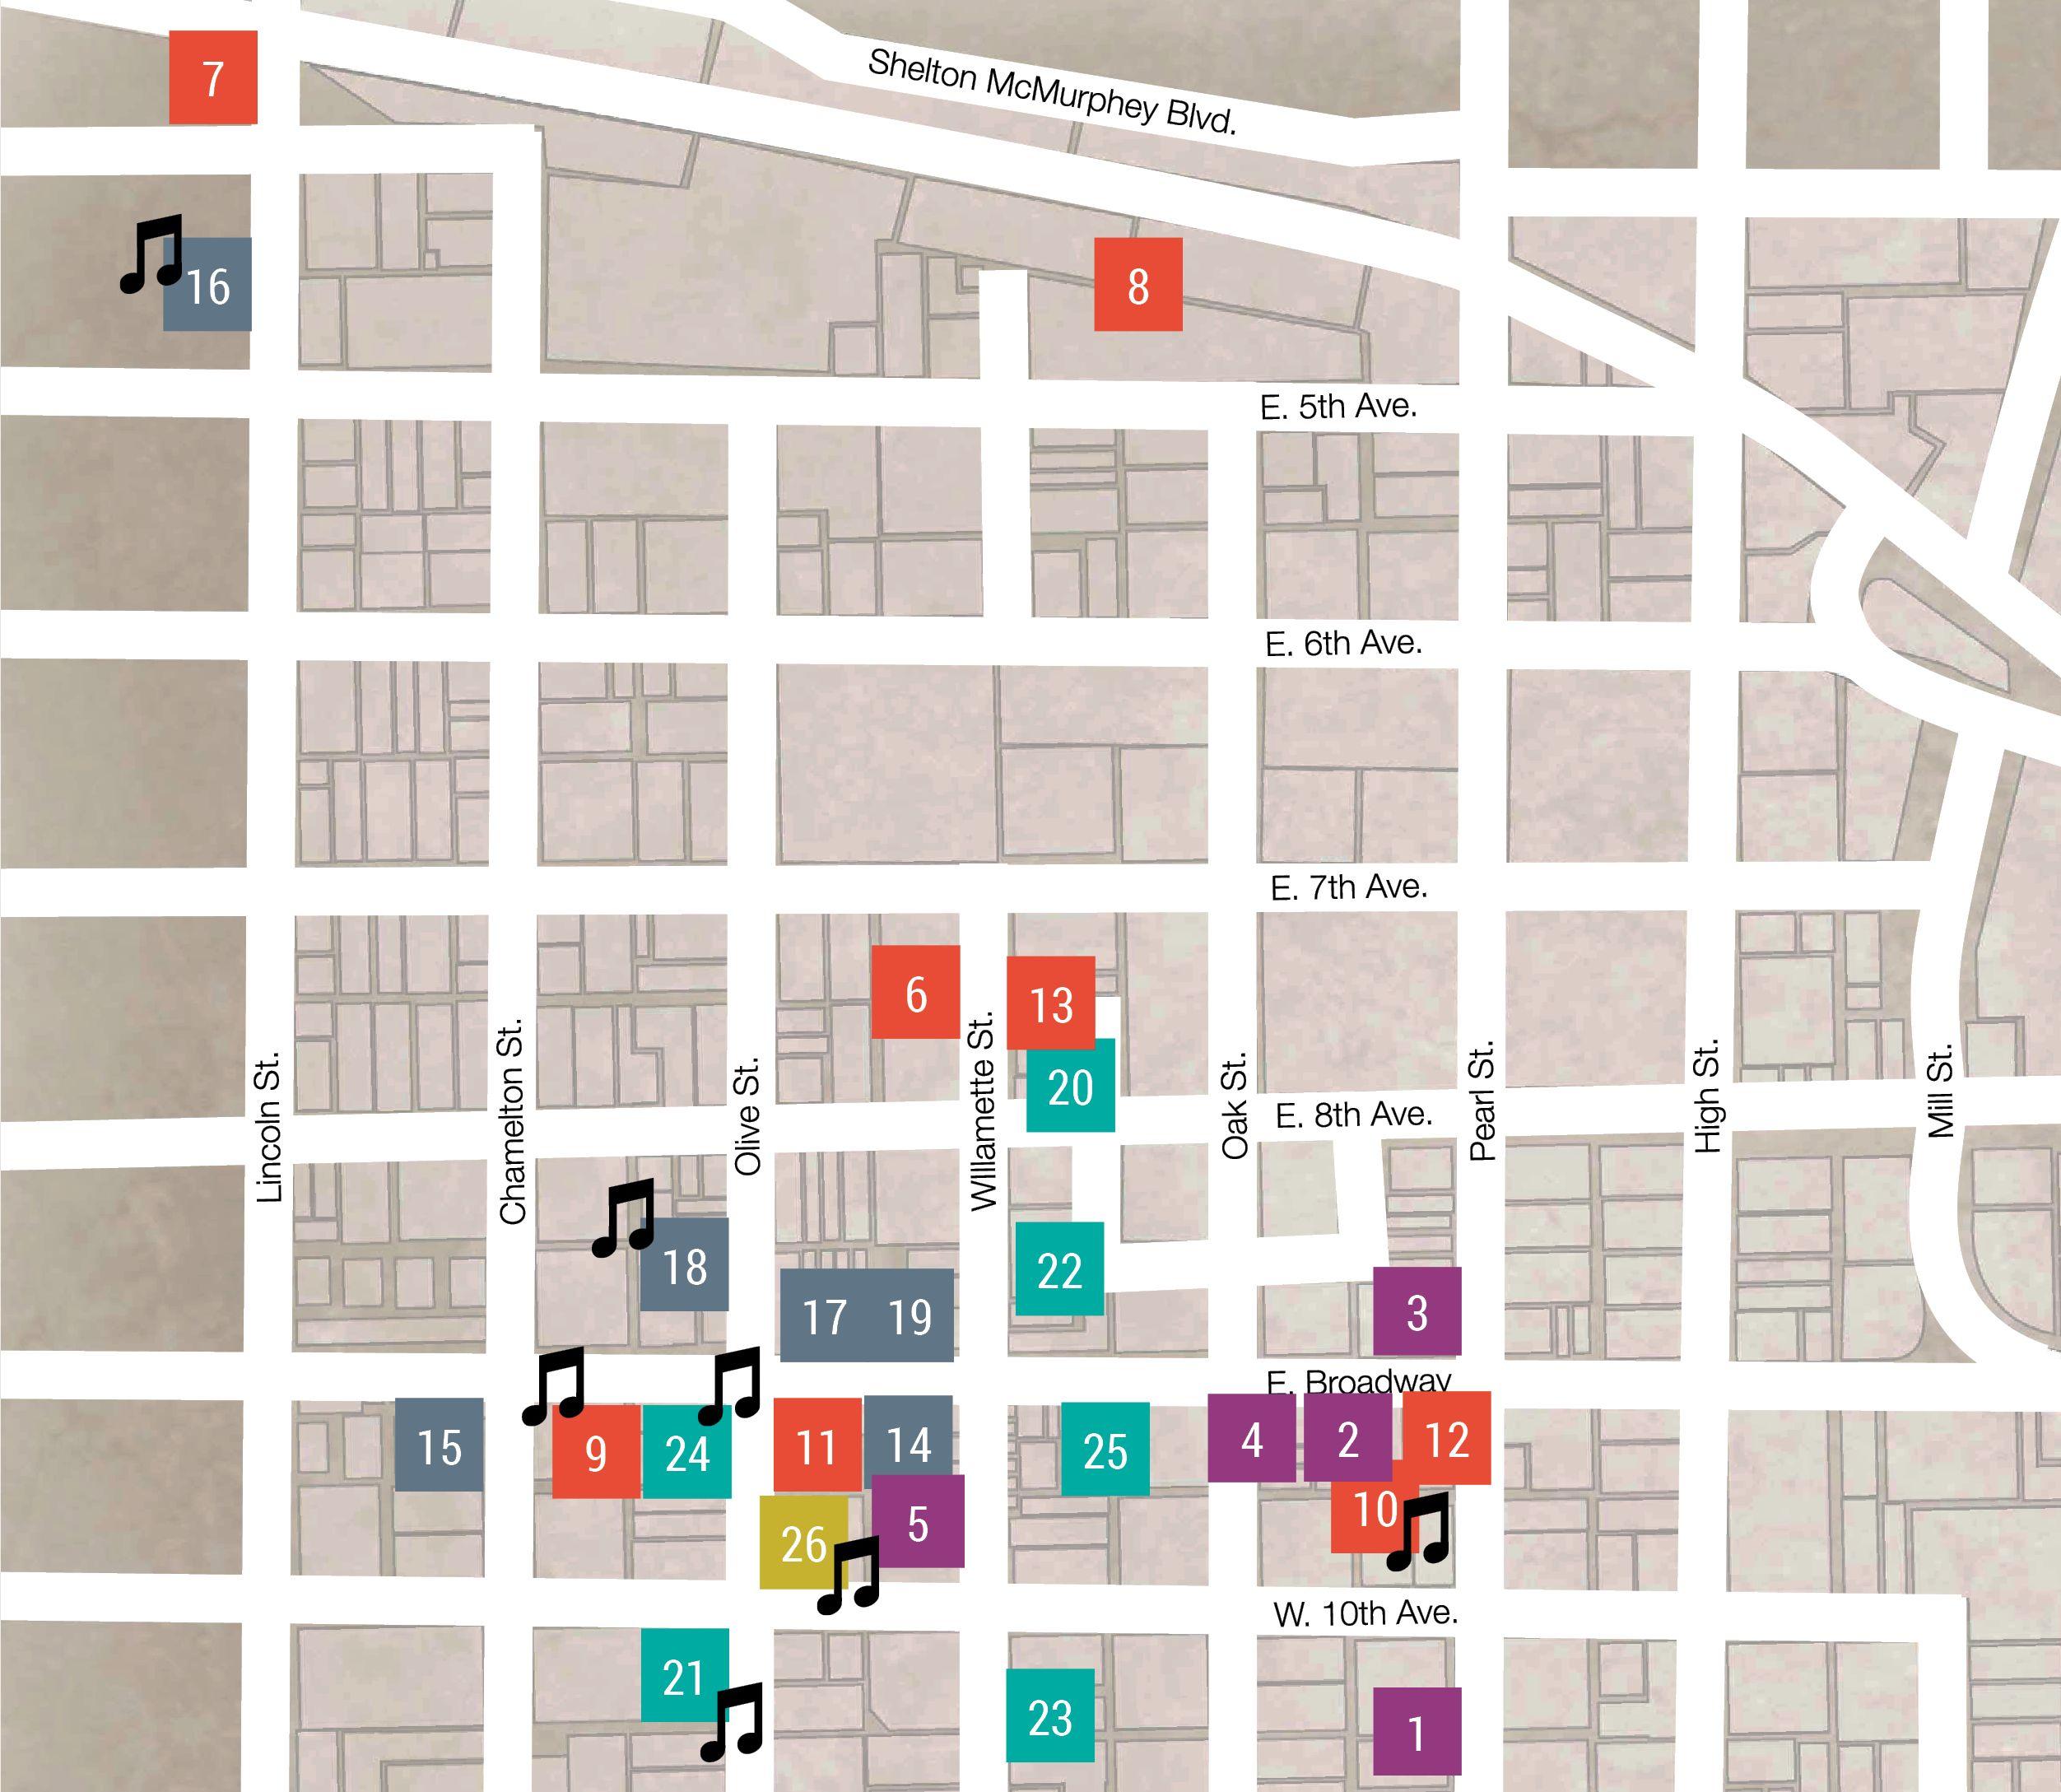 February 2016 ArtWalk map